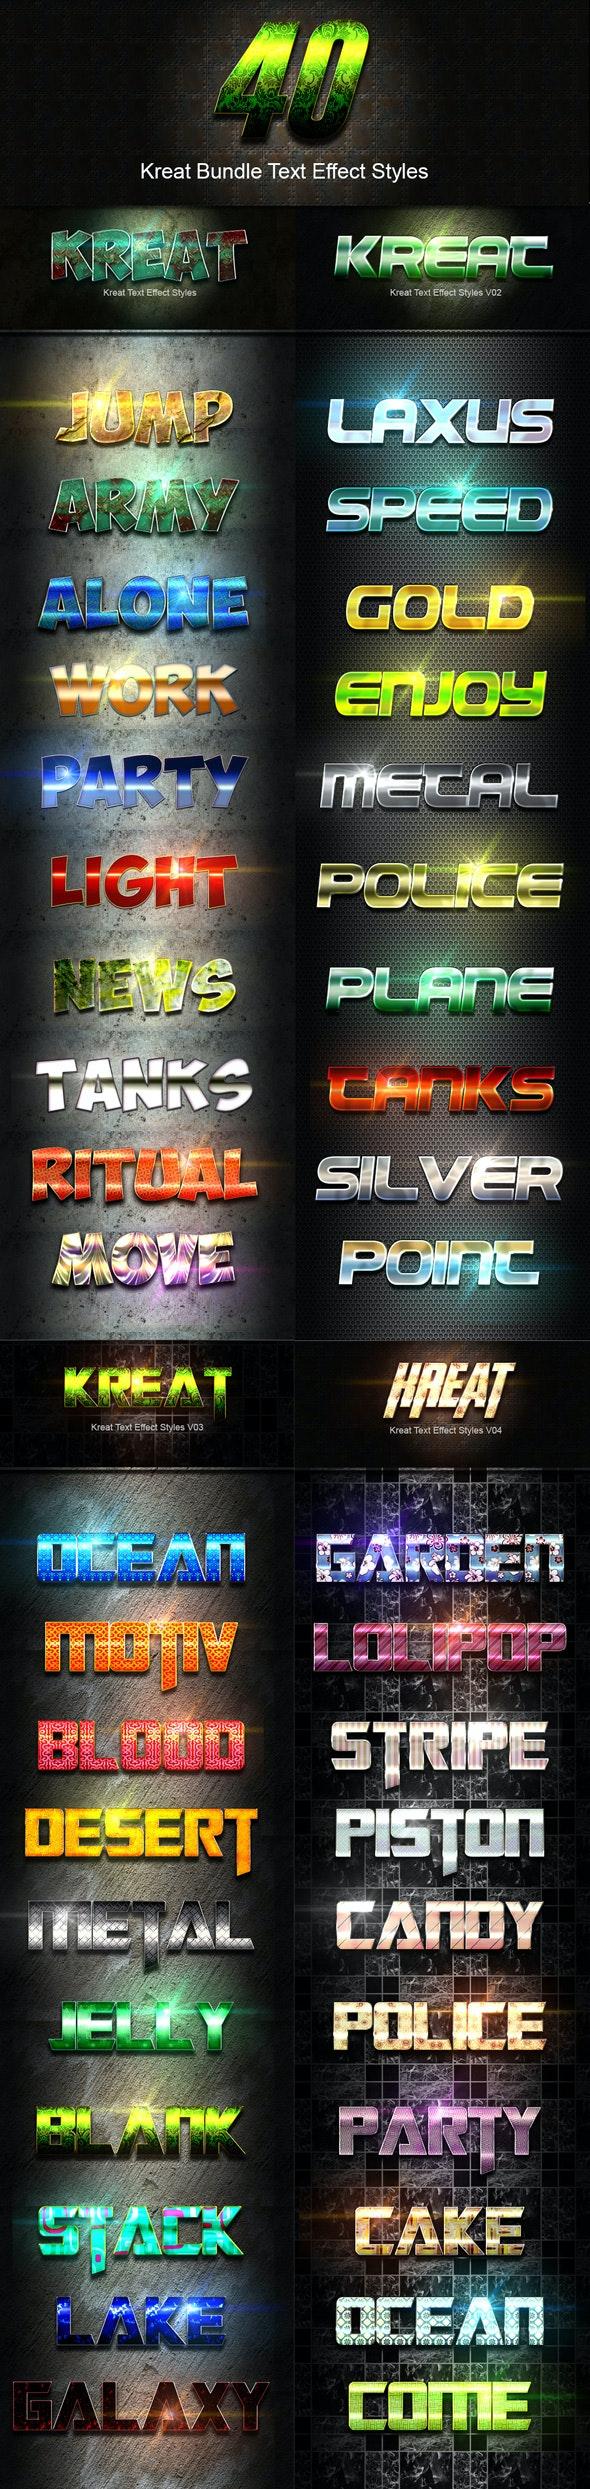 40 Kreat Bundle Text Effect Styles - Text Effects Styles